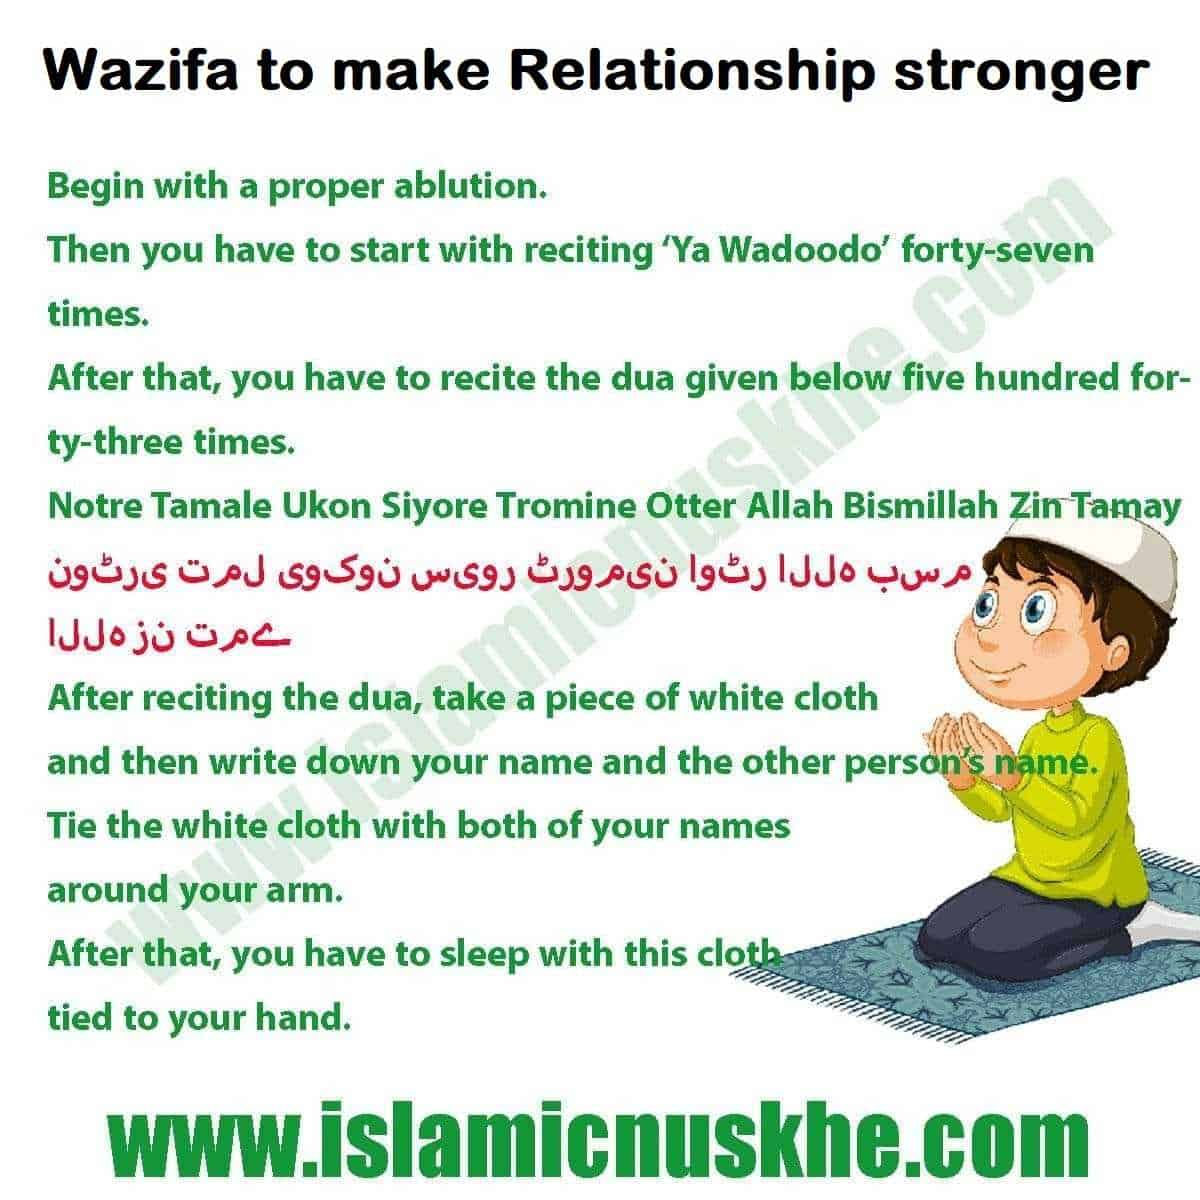 Wazifa to Make Relationship Stronger